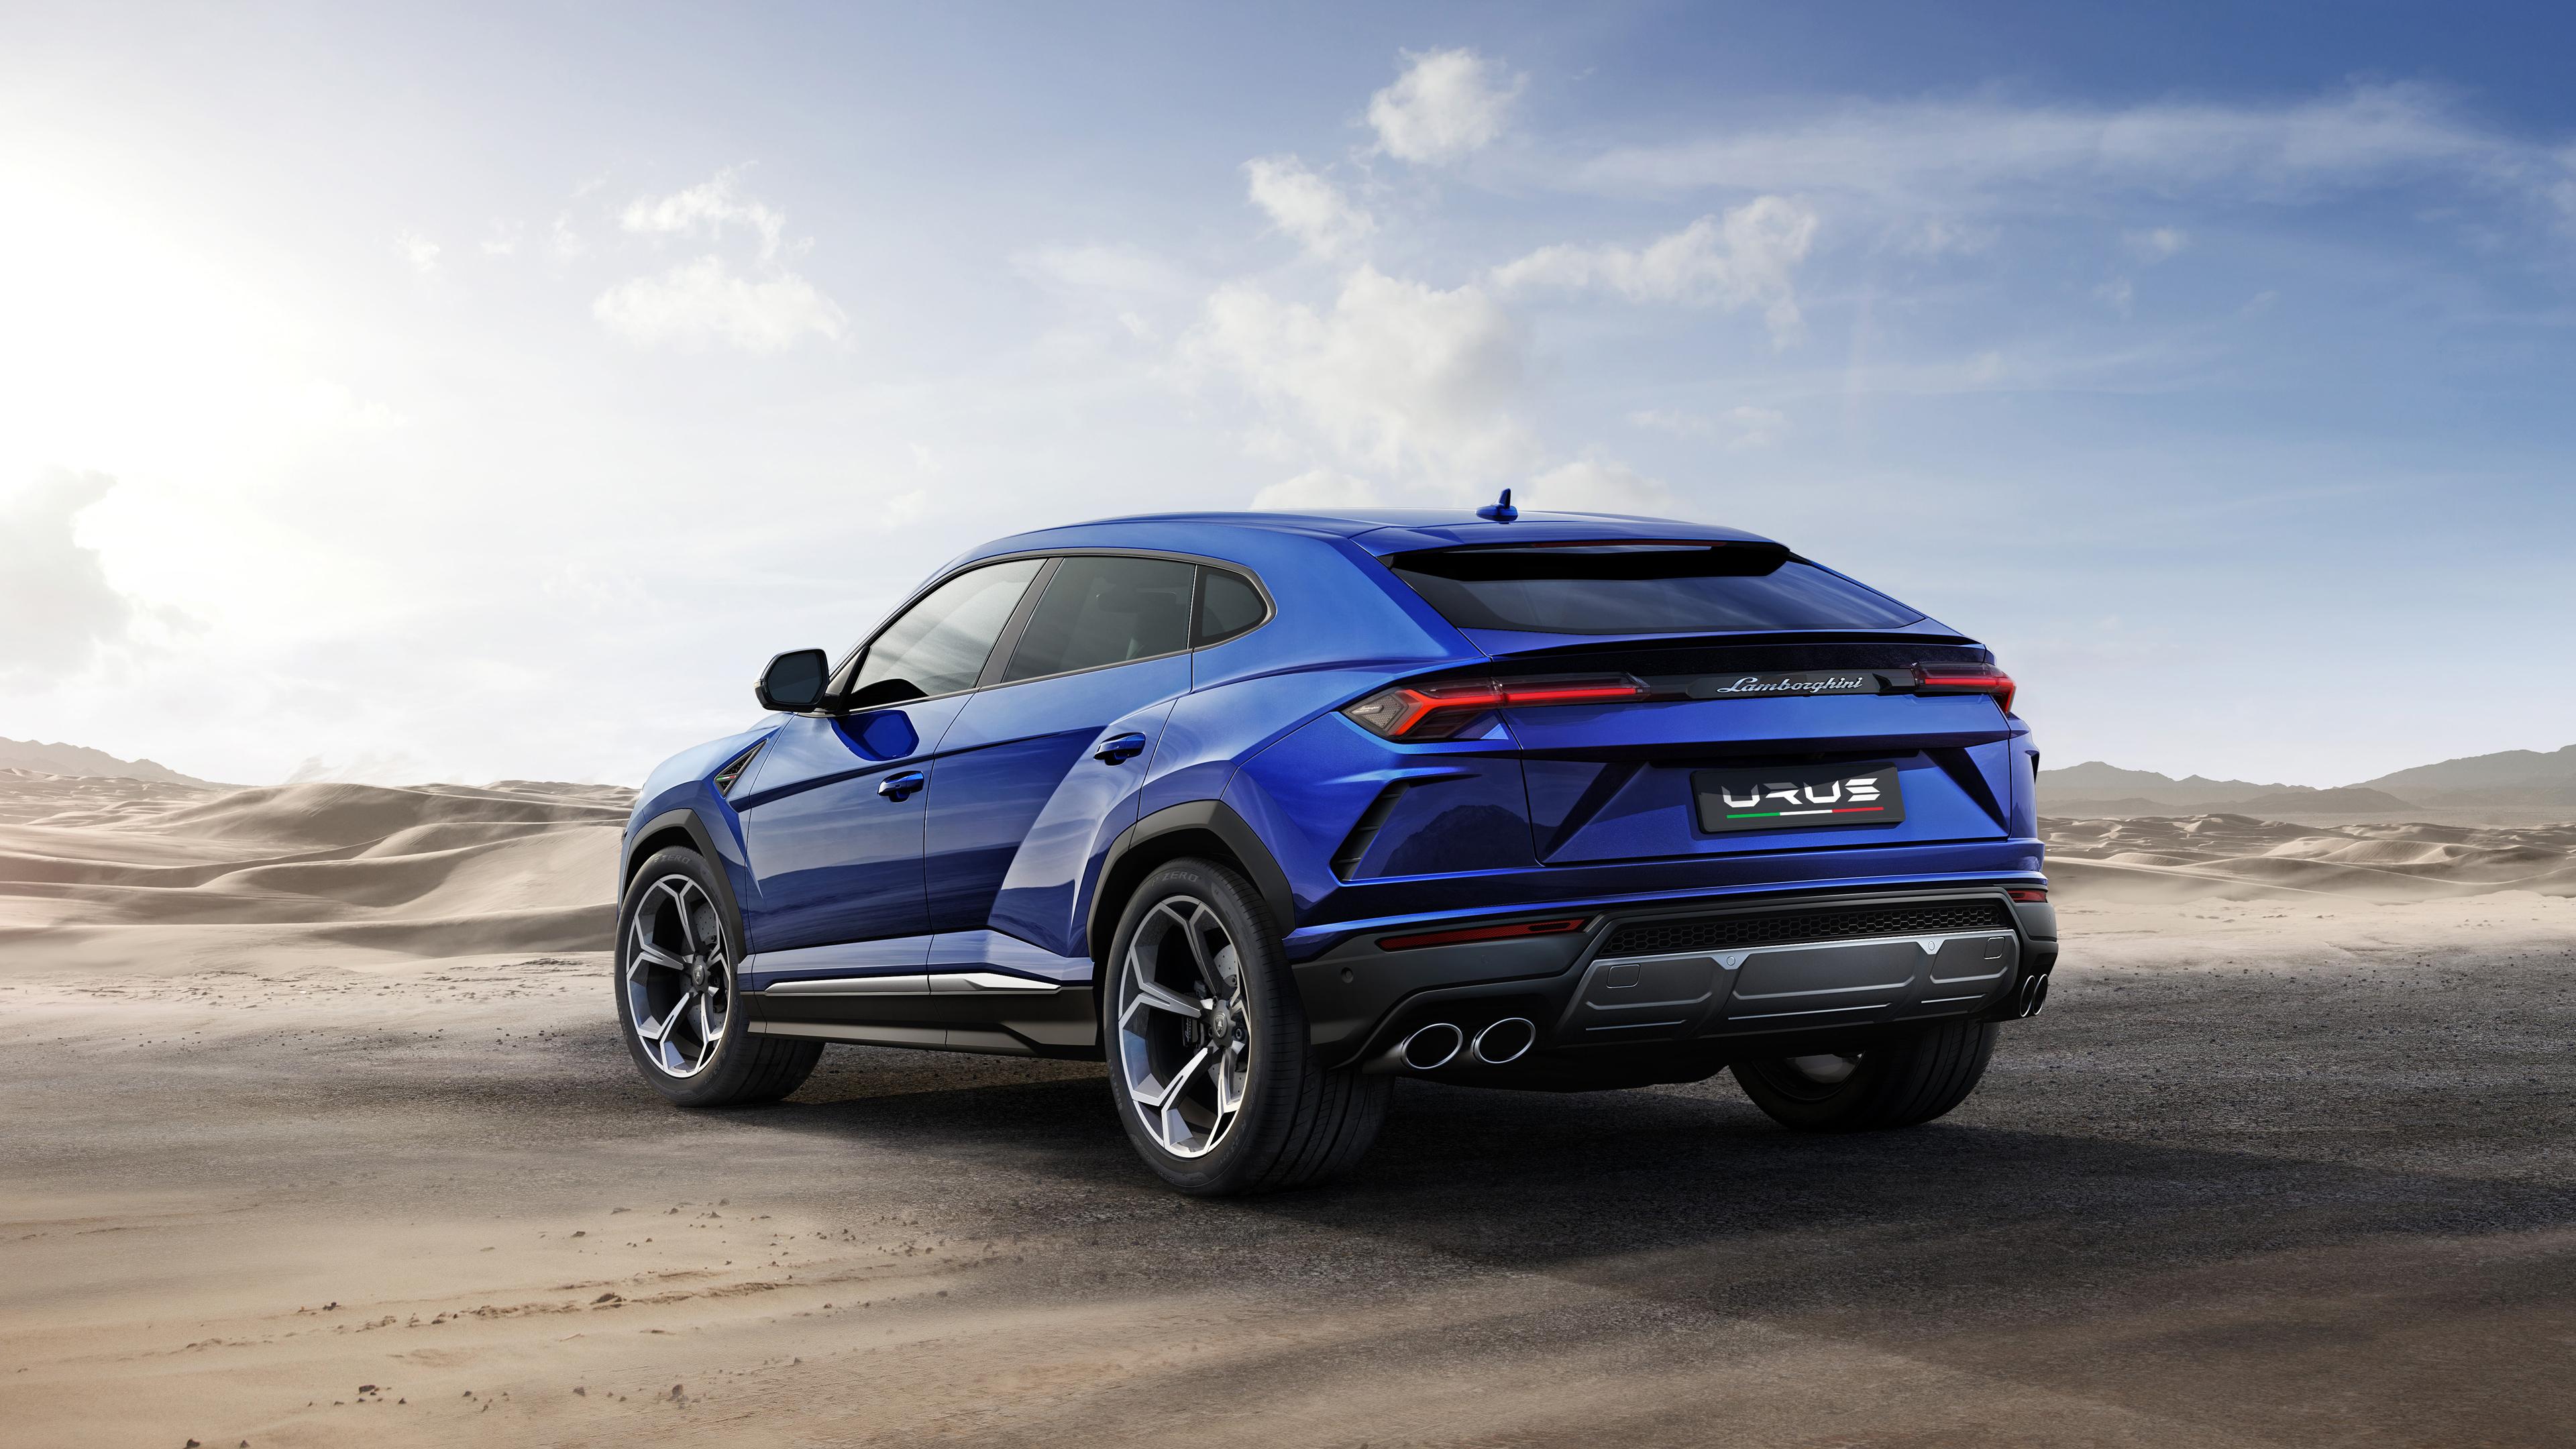 2018 Lamborghini Urus Off Road 4K 2 Wallpaper | HD Car Wallpapers ...